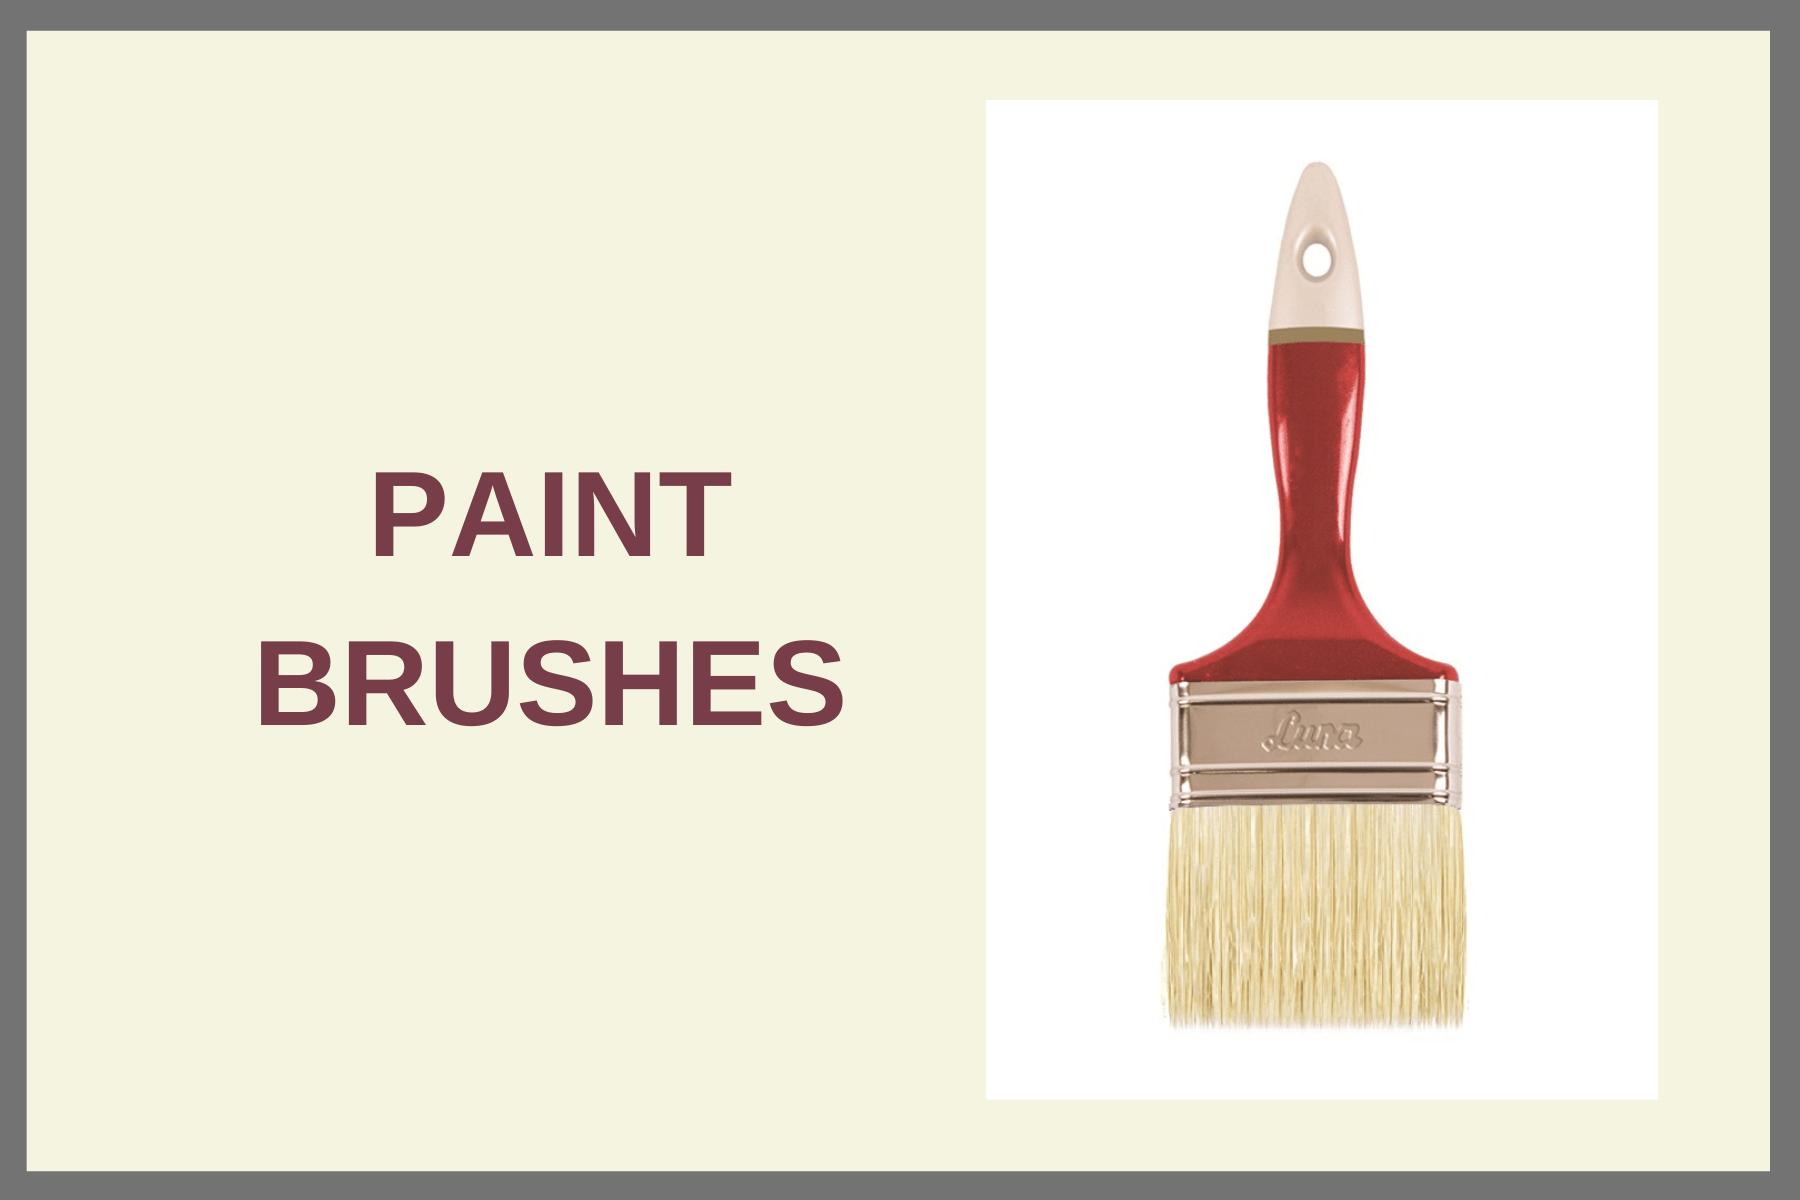 paint brush brushes painter painting pintar farbe vernice pittura colore boya